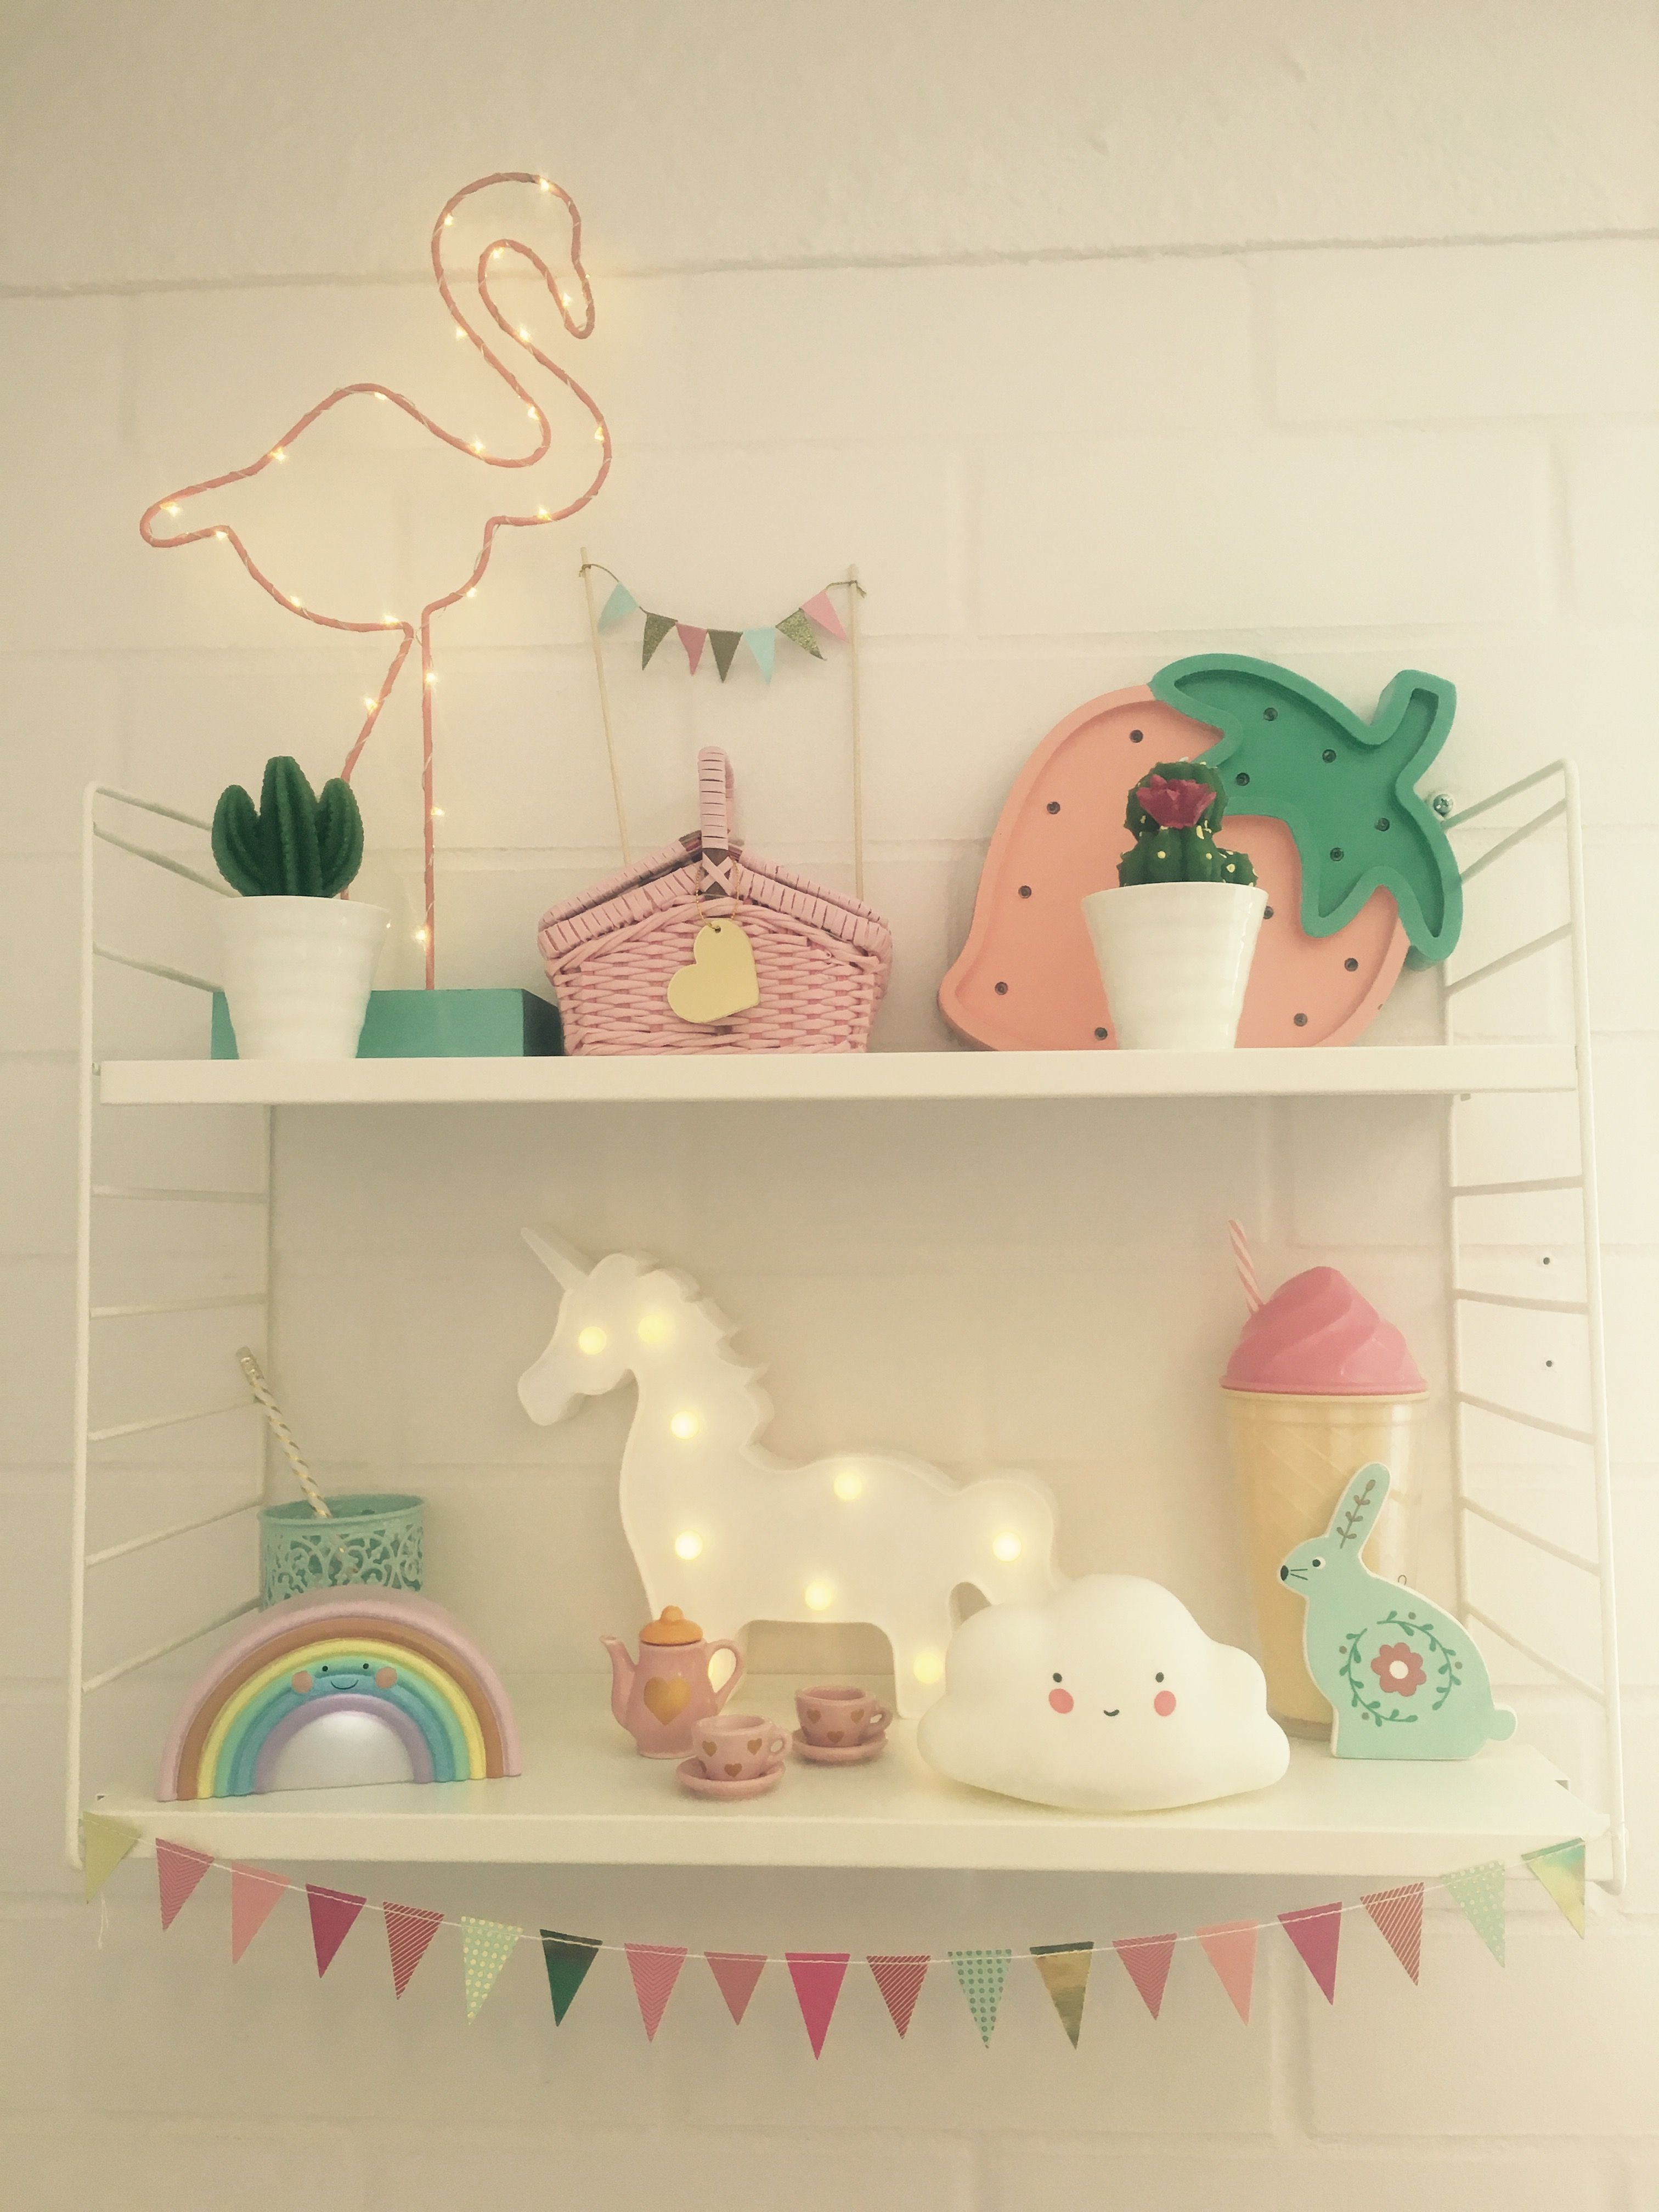 Unicorn Decor Items To Bring Rainbow Magic To Kids' Room images